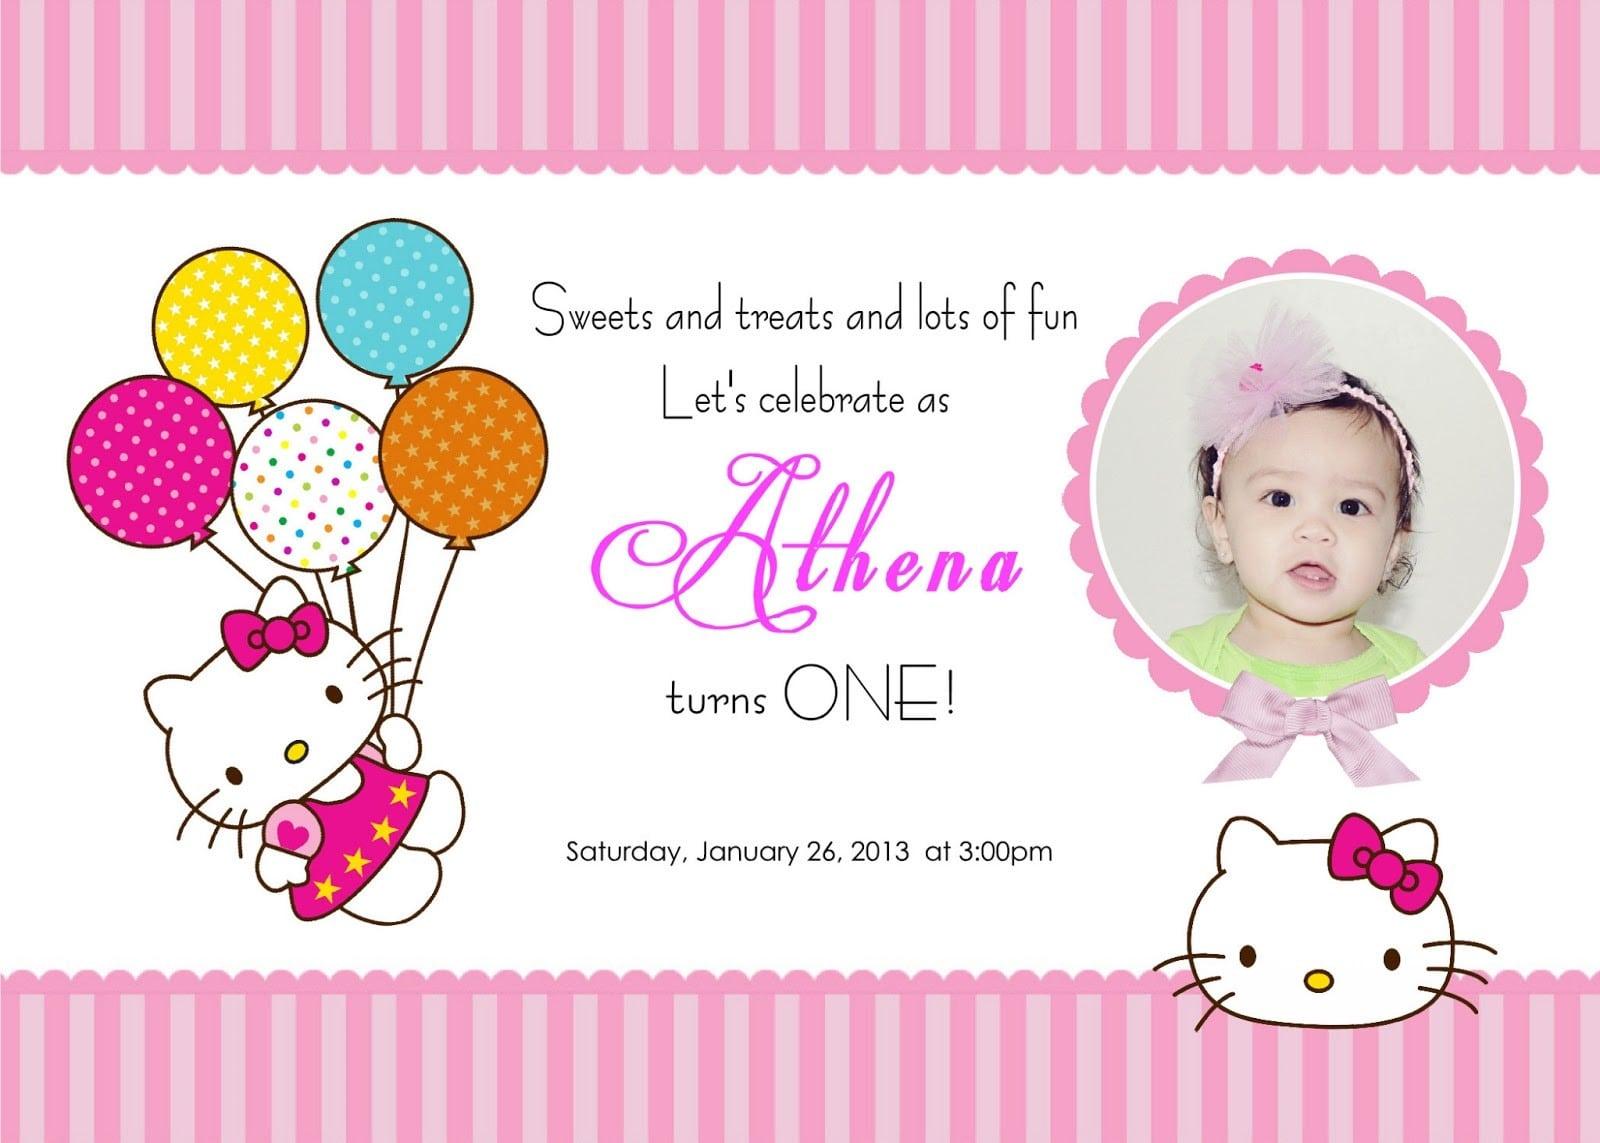 29th Birthday Party Invitation Wording -